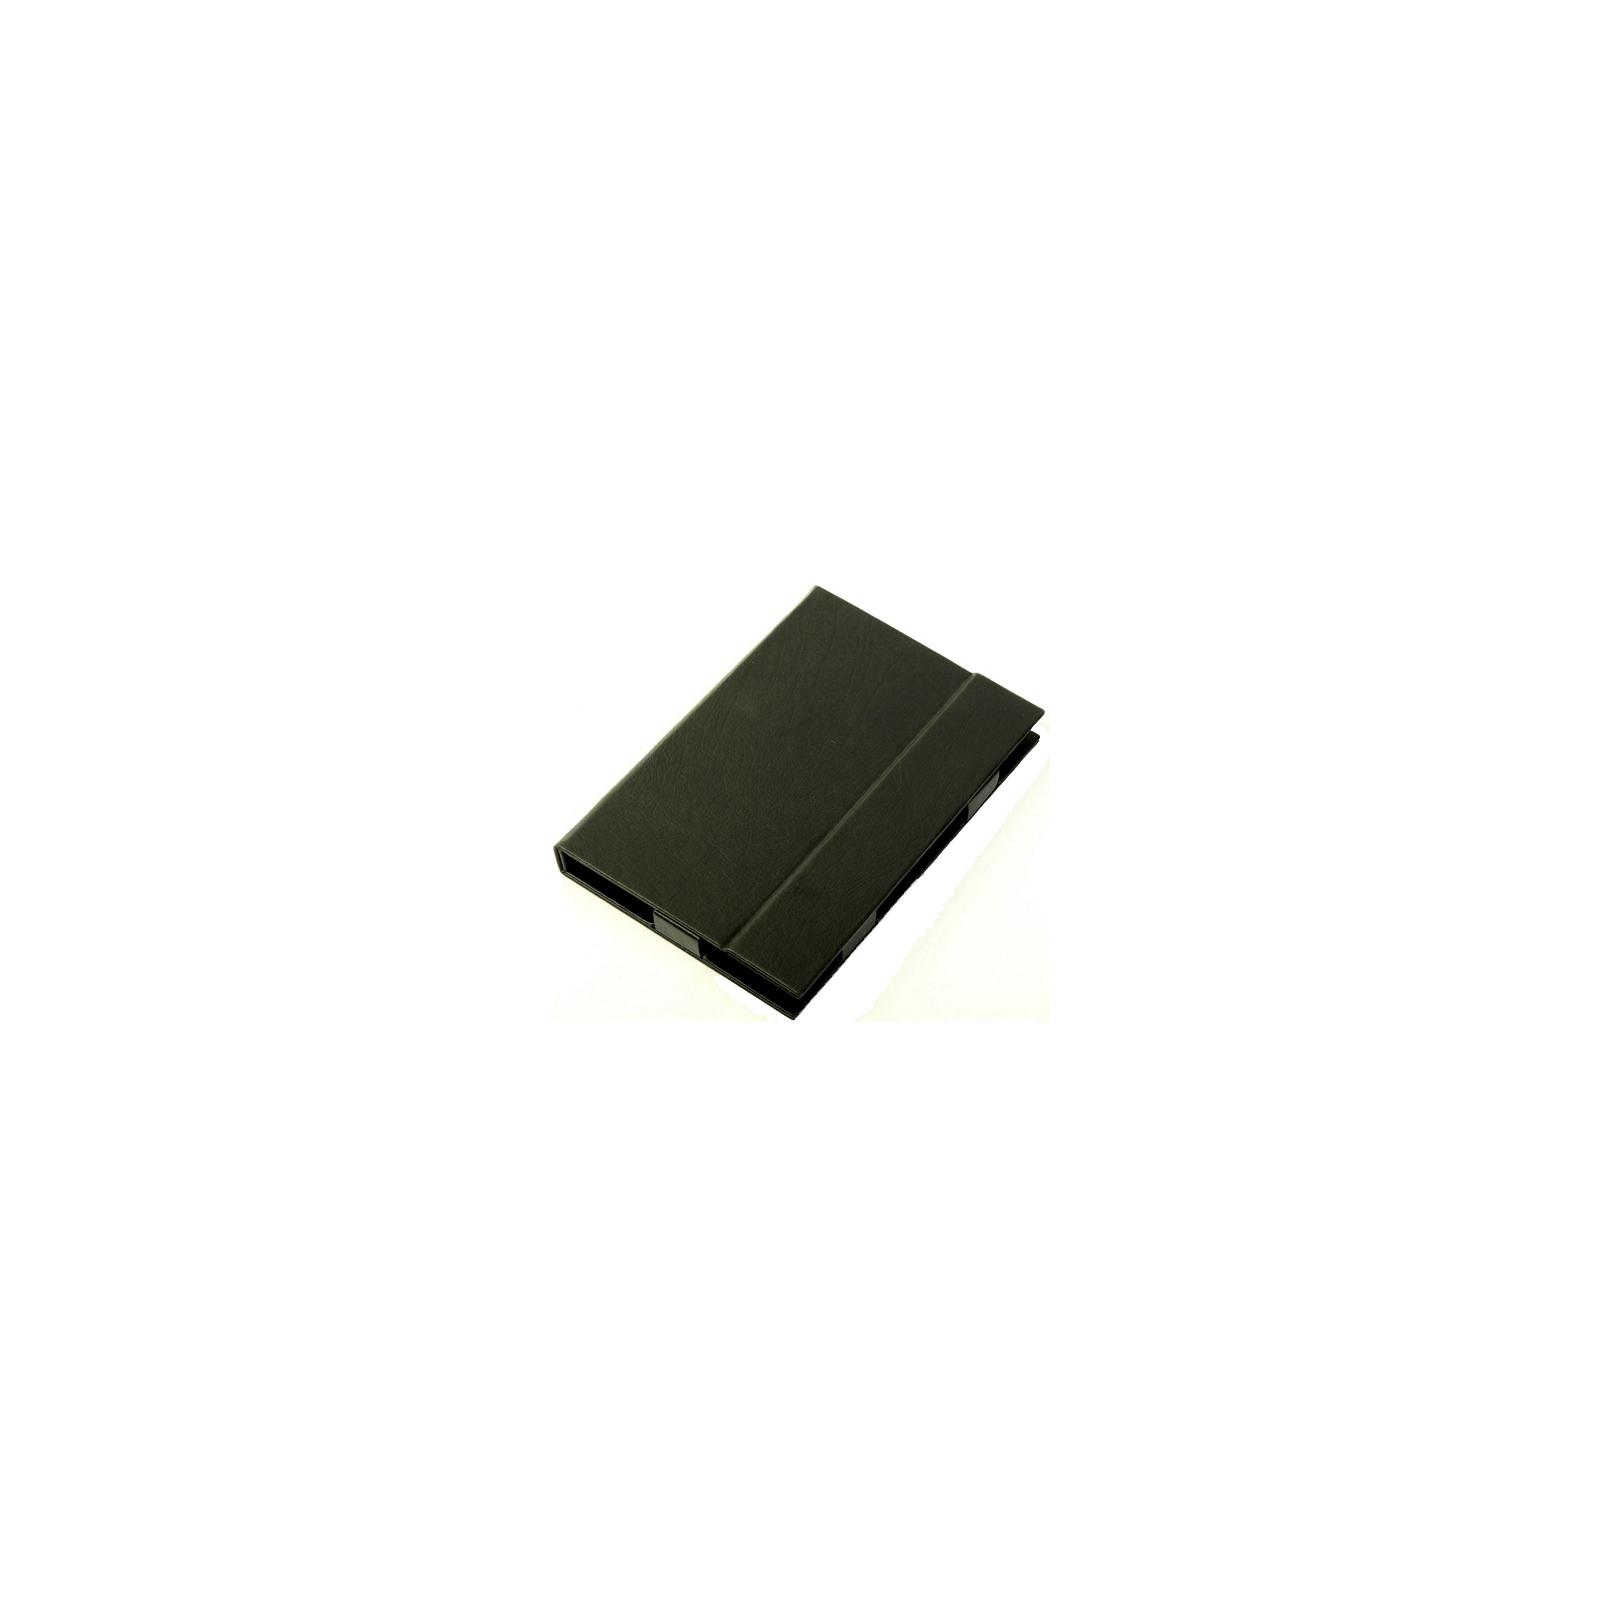 Чехол для планшета Vento 9 Desire Matt - black